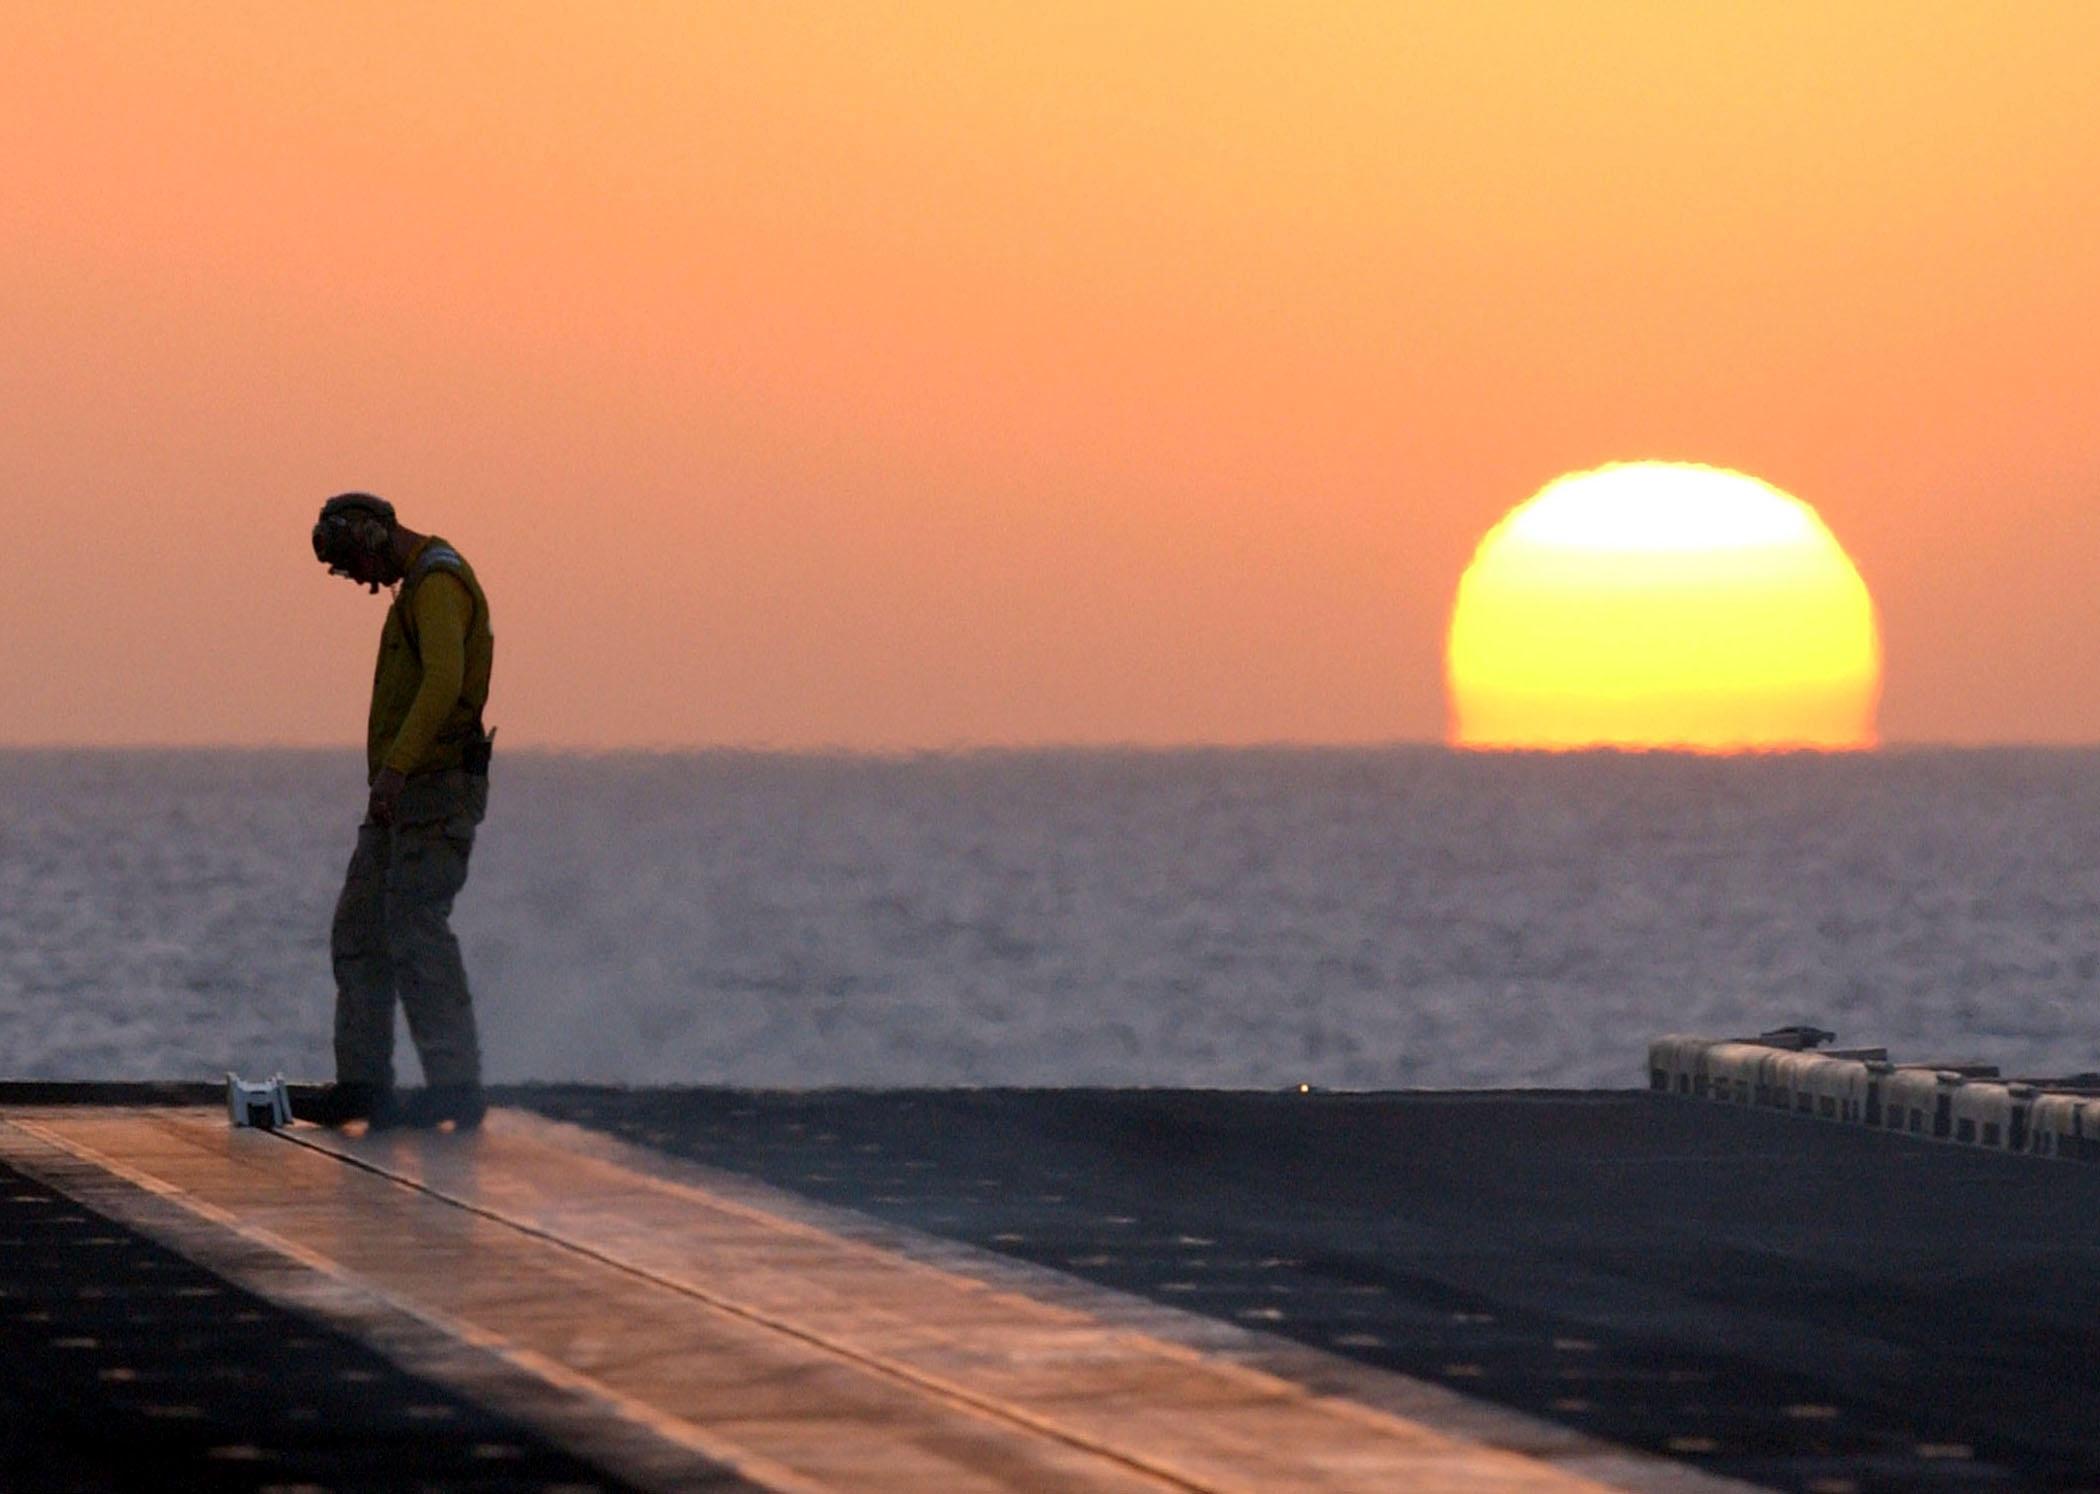 Sunset on the ship photo